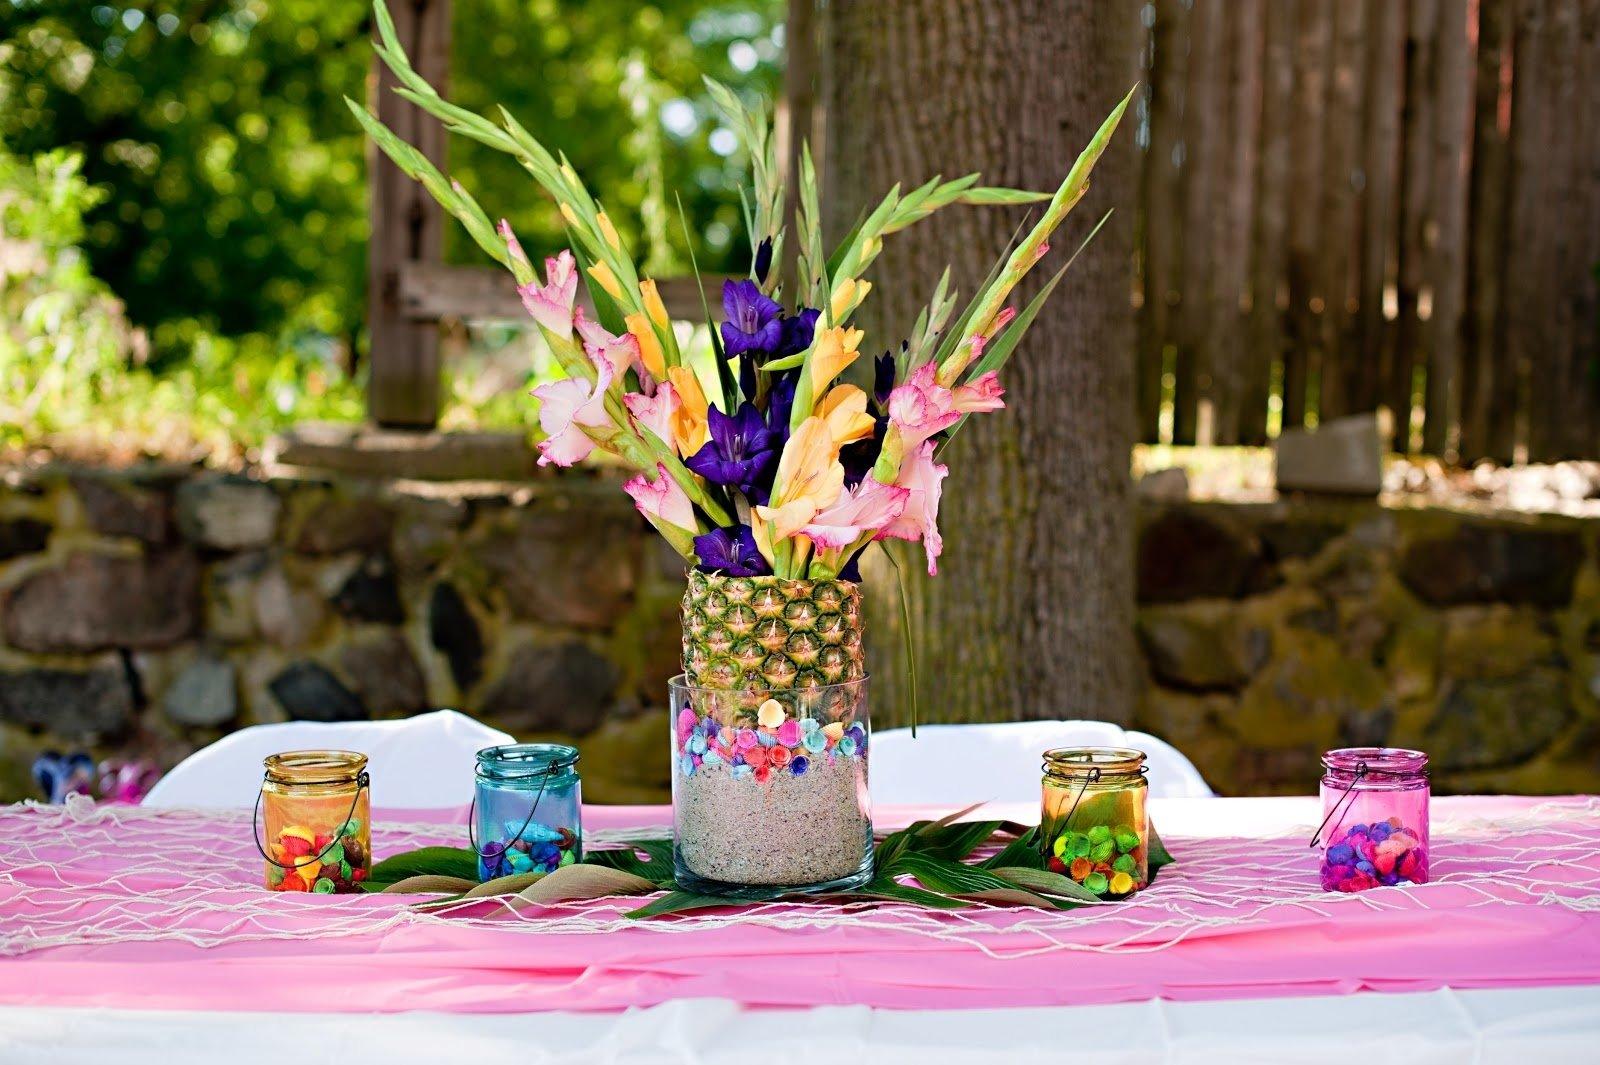 10 Attractive Ideas For A Luau Party luau table centerpiece ideas webtechreview 2020